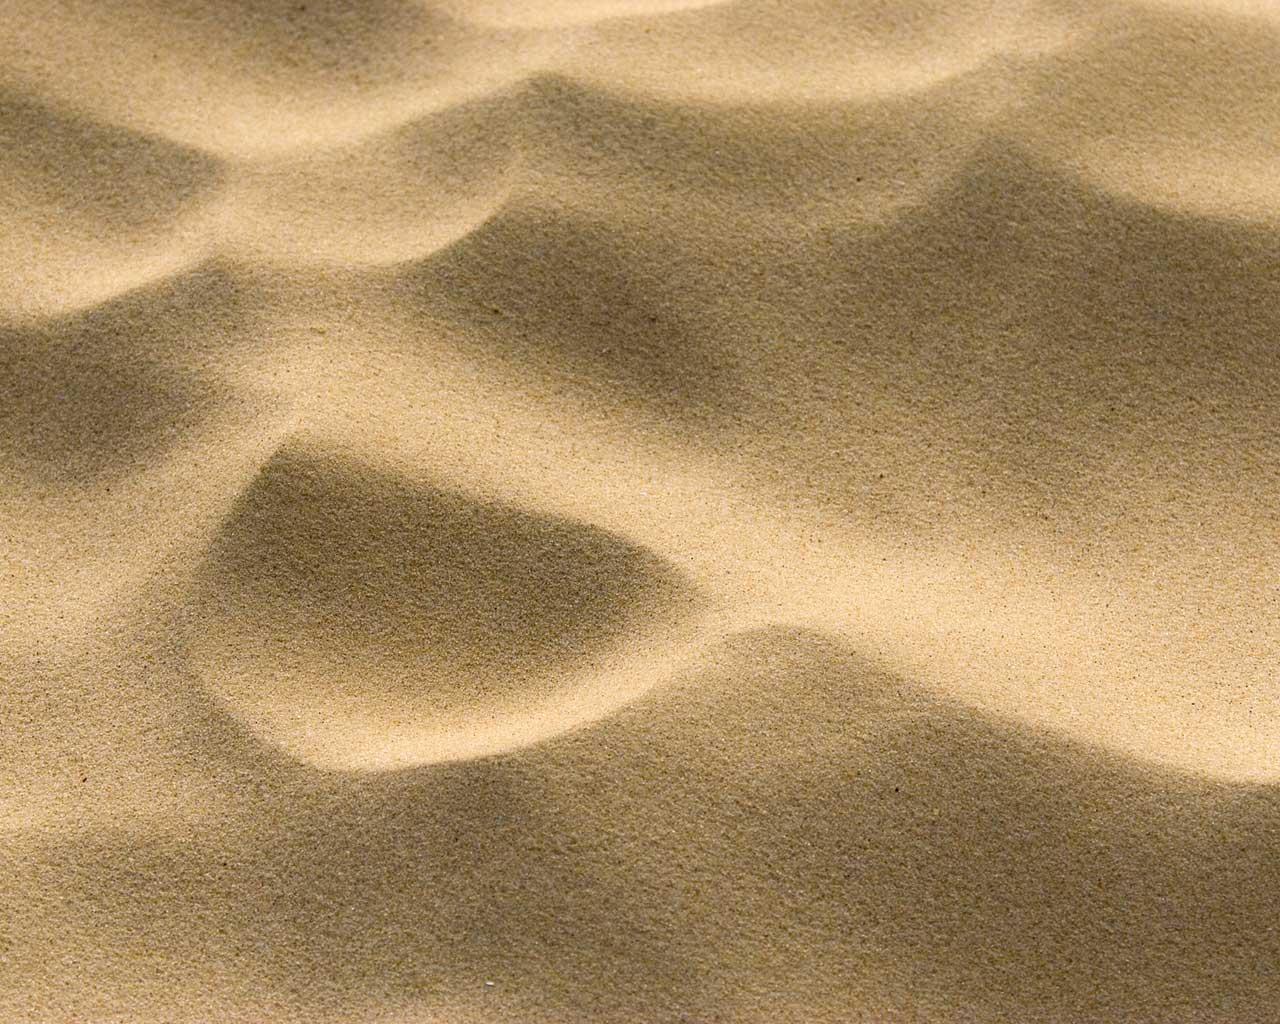 Sand clipart sand dune Image Clker art clip vector